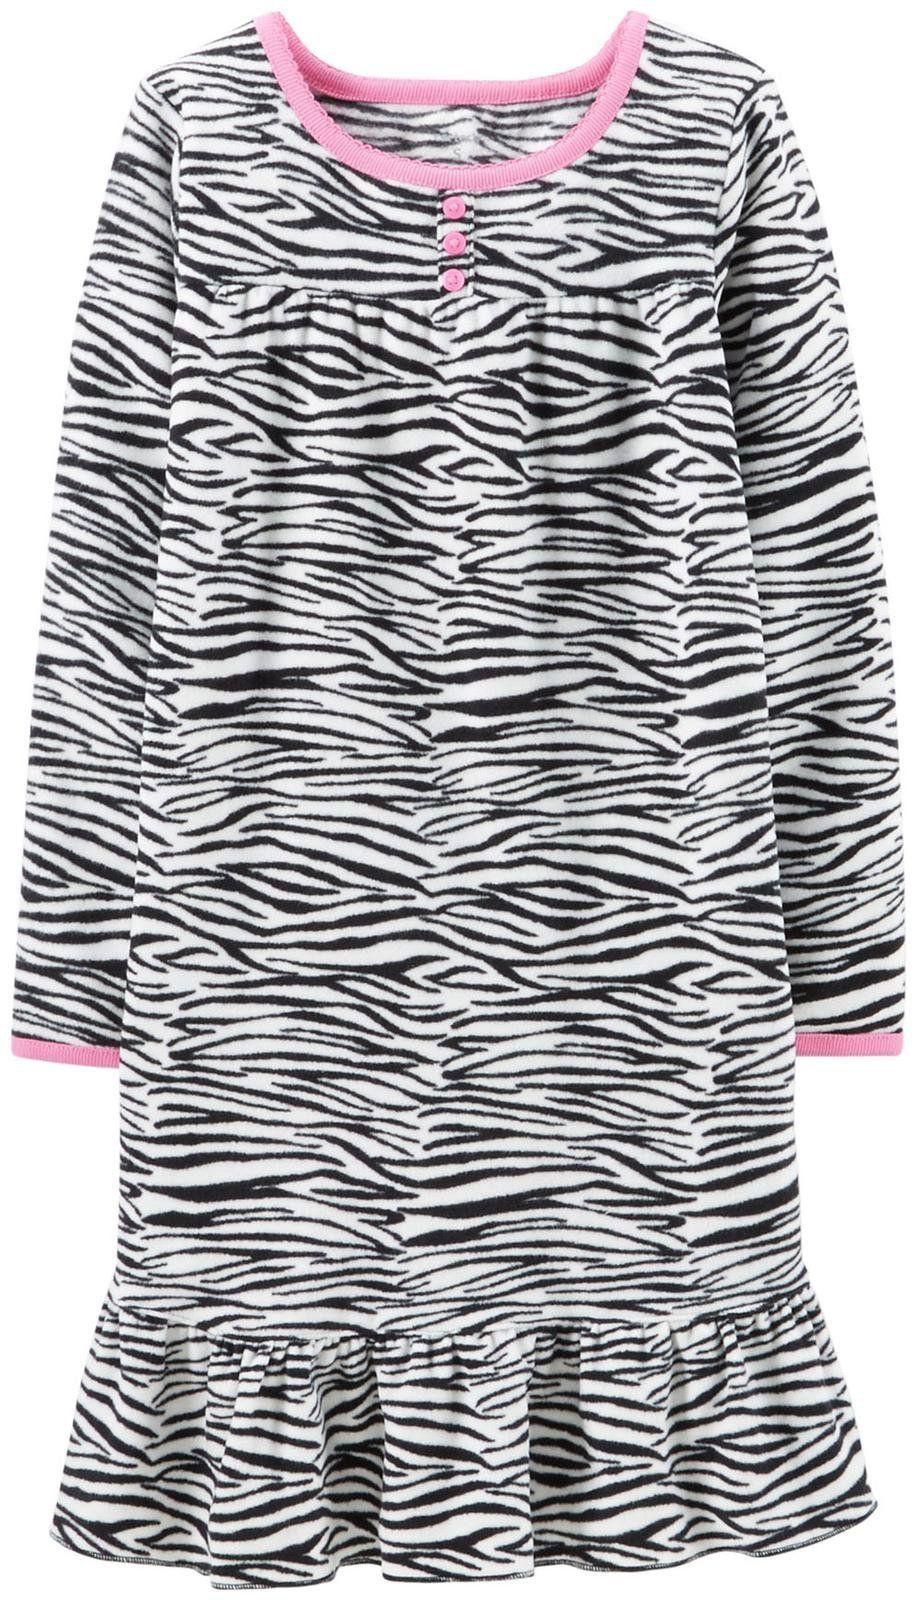 35c5efbf5fb3 Carter s Little Girls  Fleece Nightgown (Toddler Kid) - Zebra - 4-5 ...